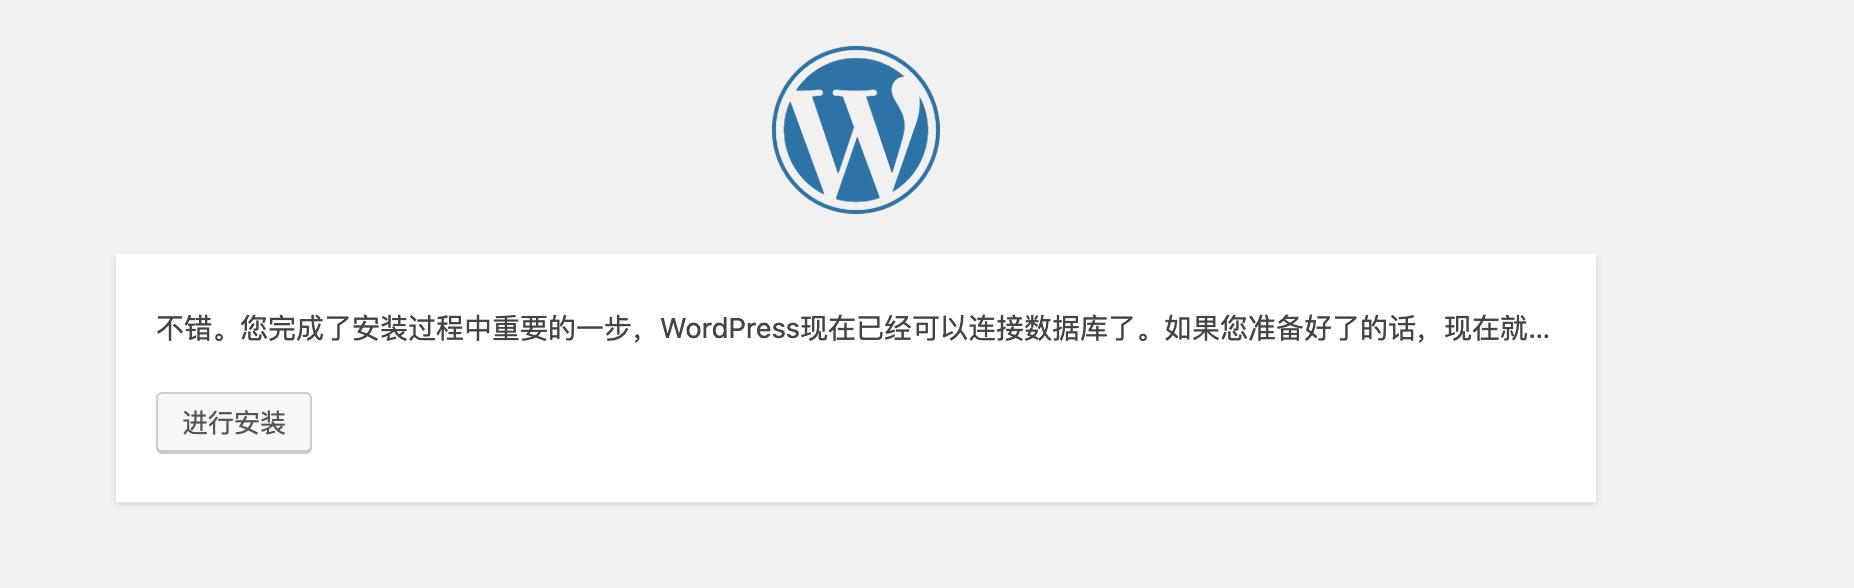 WordPress 配置数据库完成提示